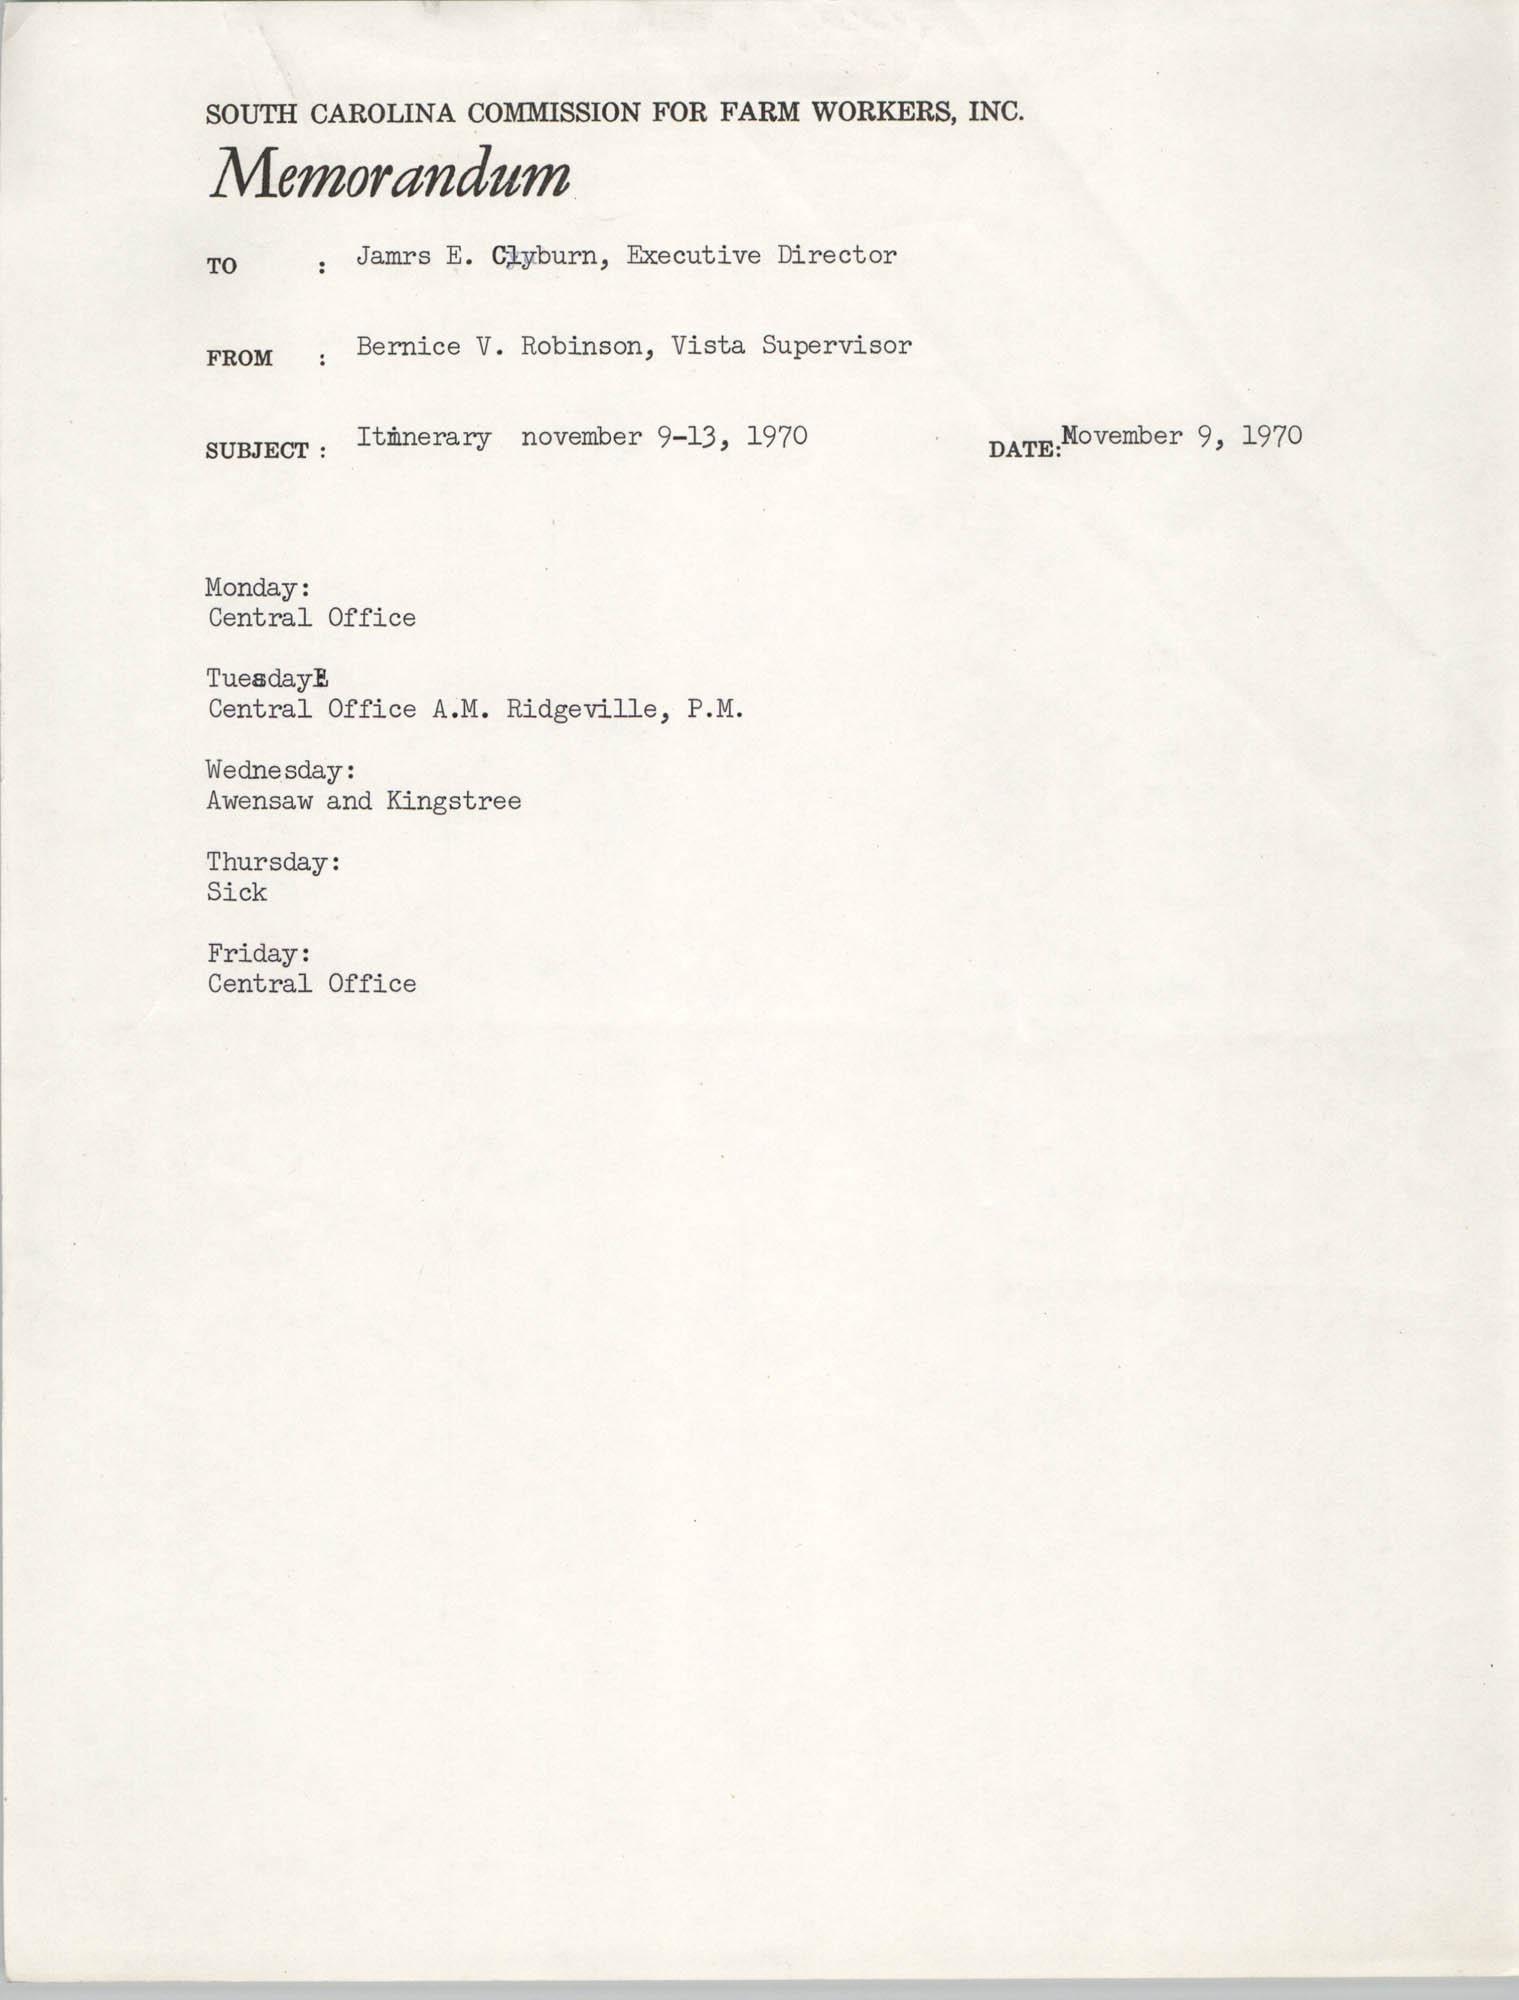 Memorandum from Bernice V. Robinson to James E. Clyburn, November 9, 1970